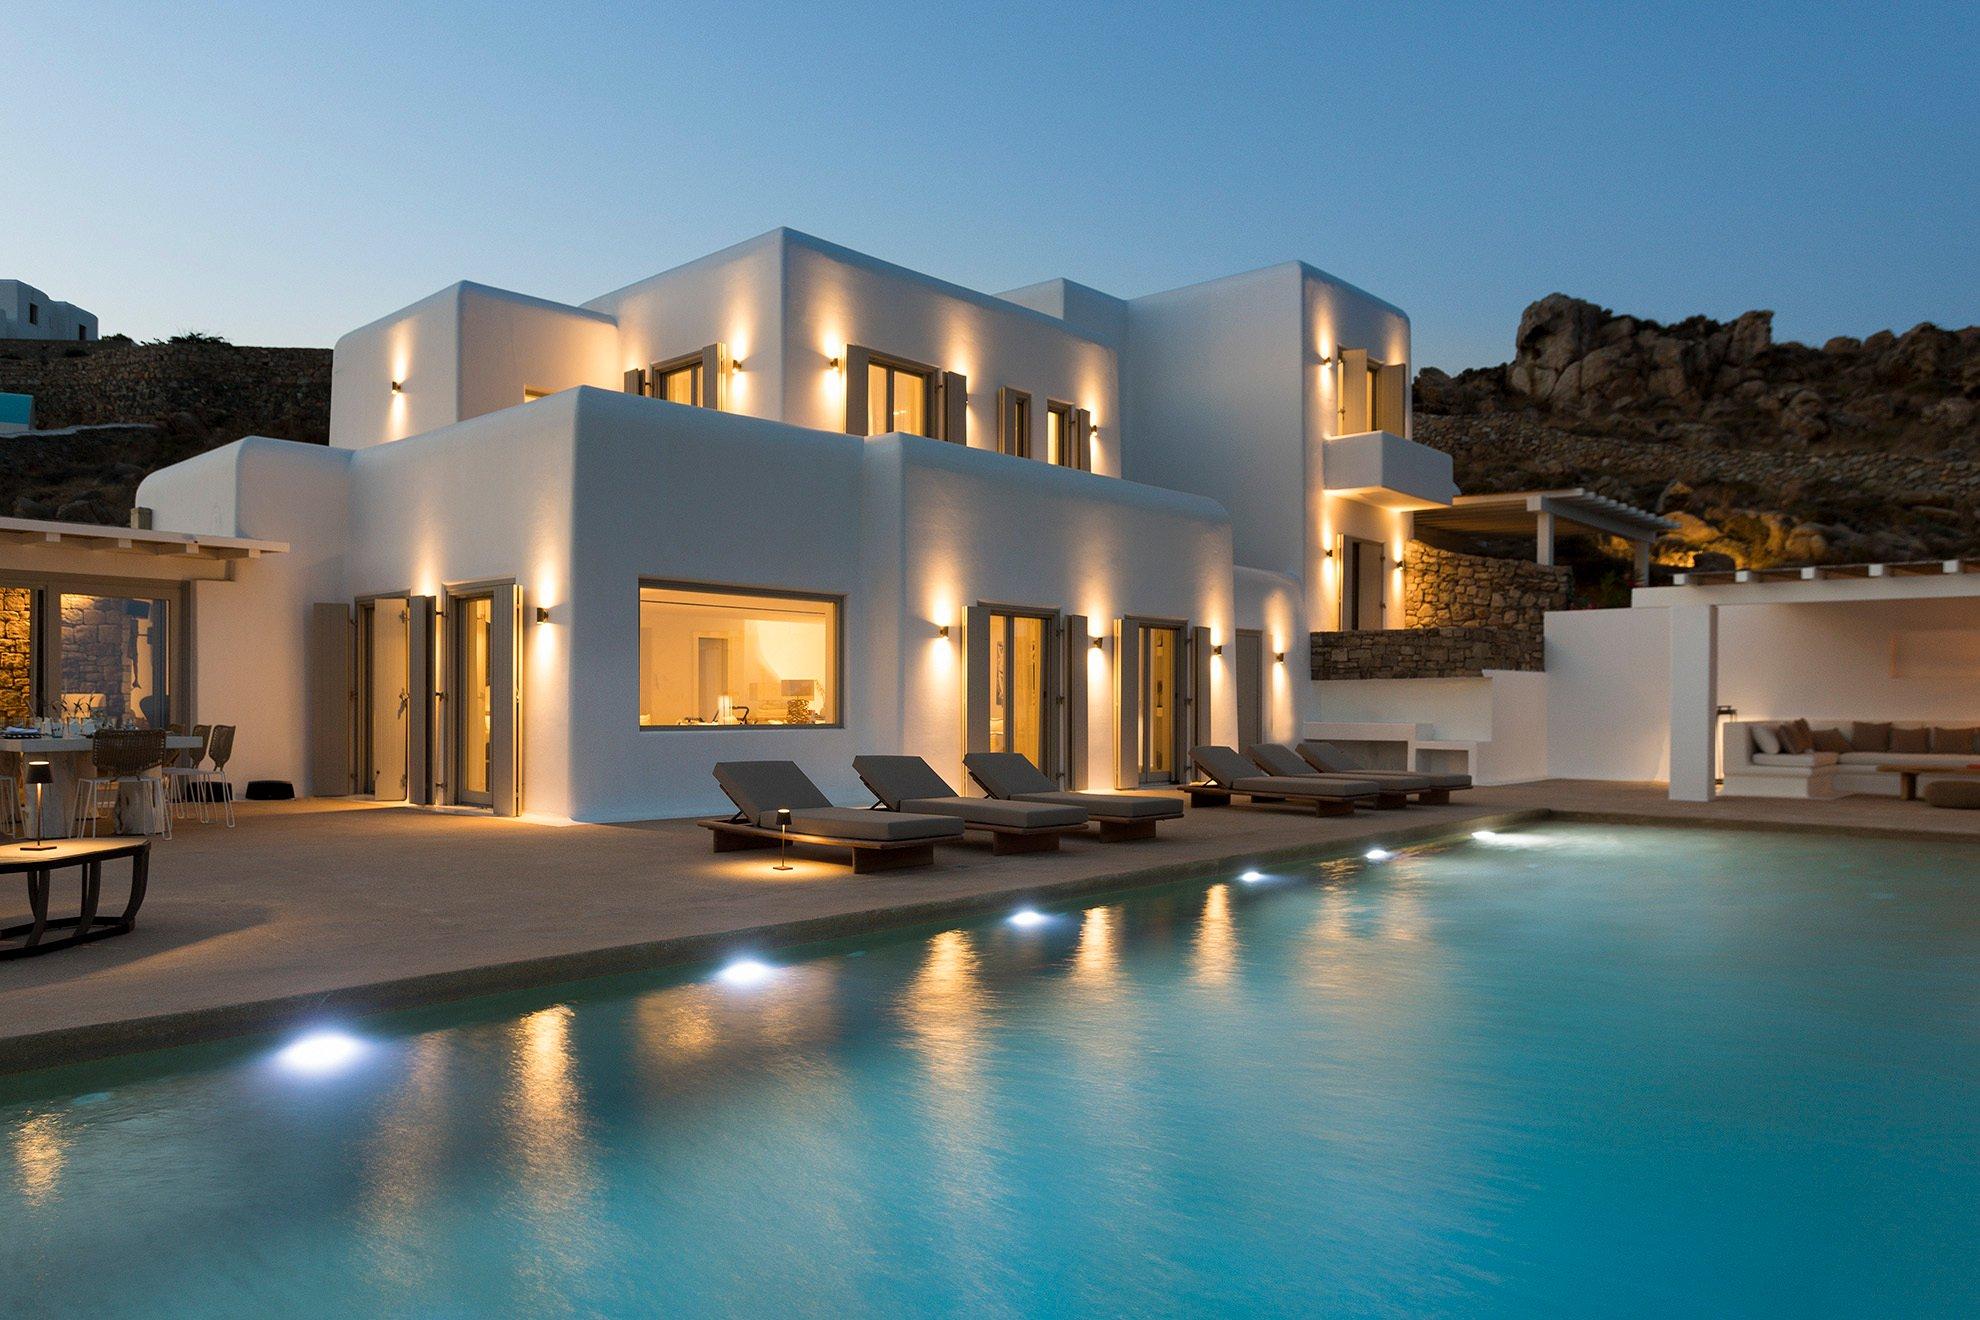 Villa in Agios Ioannis Diakoftis, Decentralized Administration of the Aegean, Greece 1 - 11427406